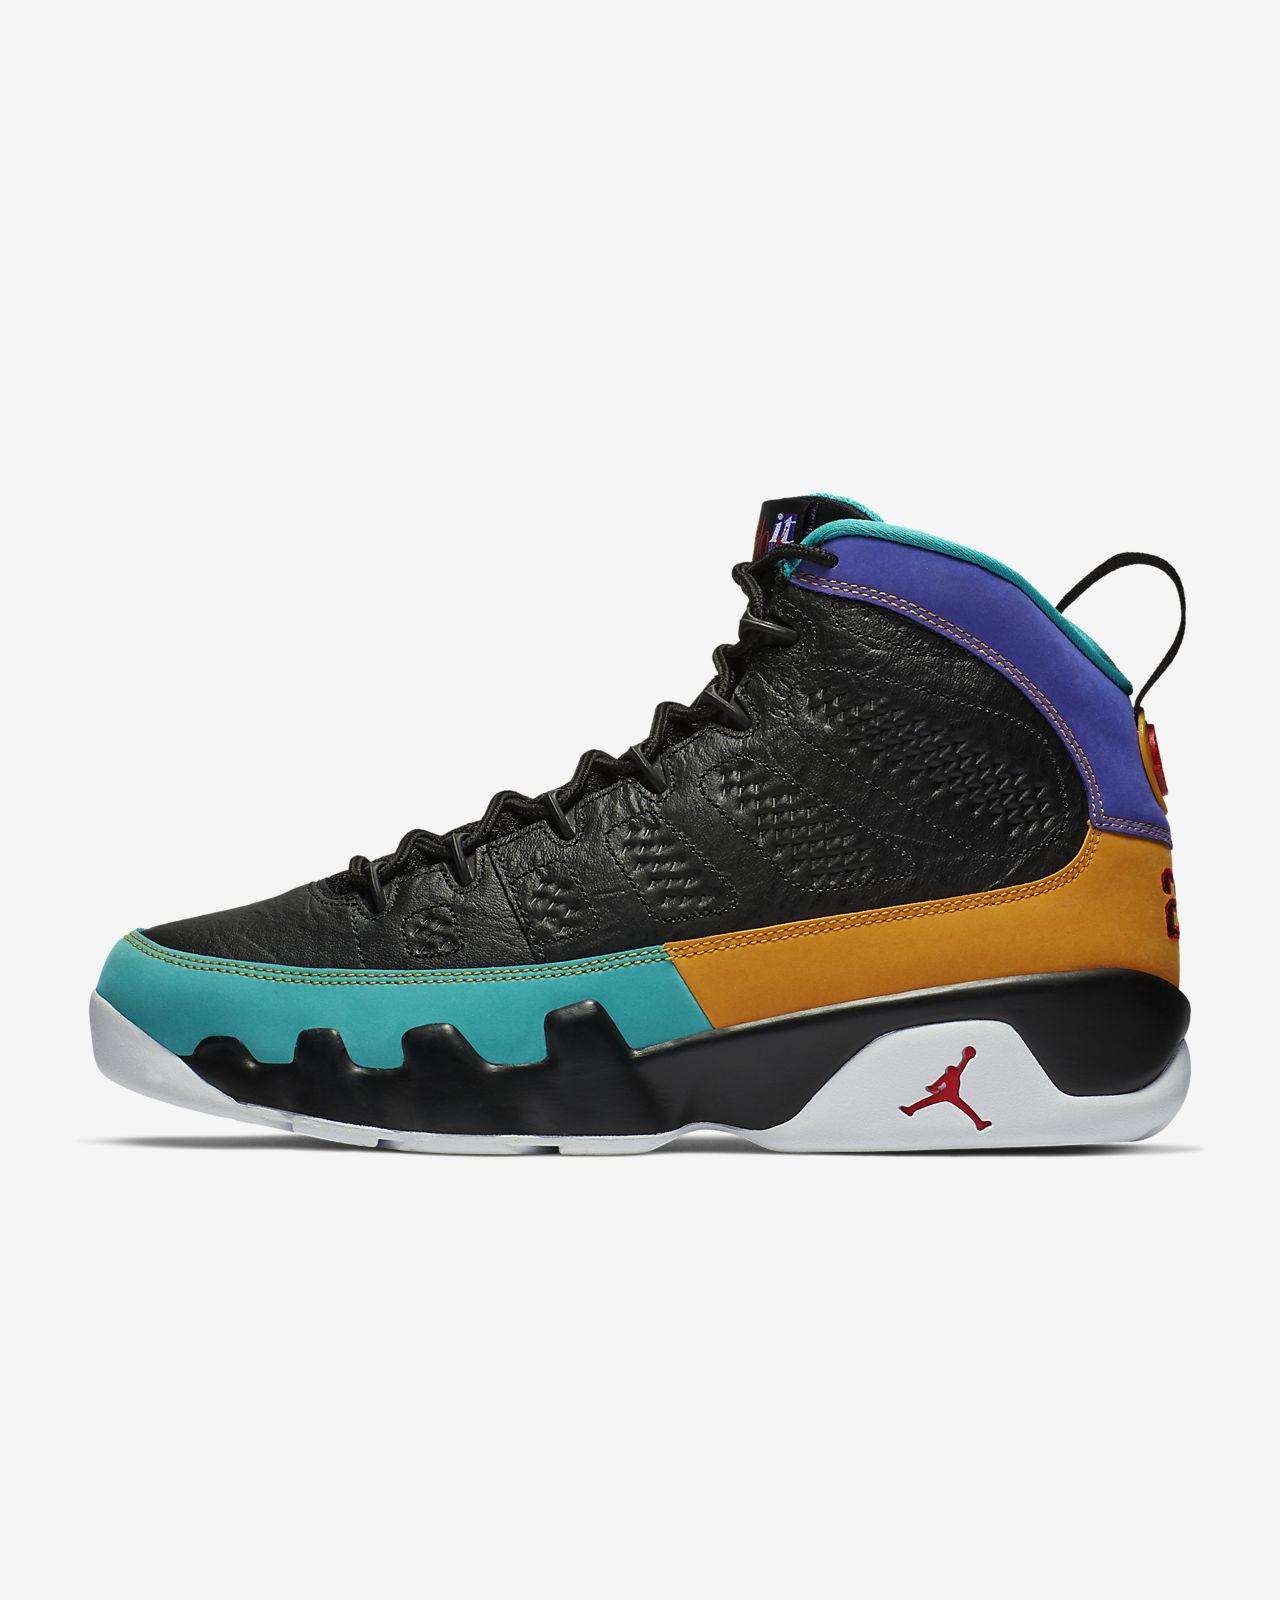 7f78b19115ae1 Air Jordan 9 Retro Men s Shoe. Nike.com NZ